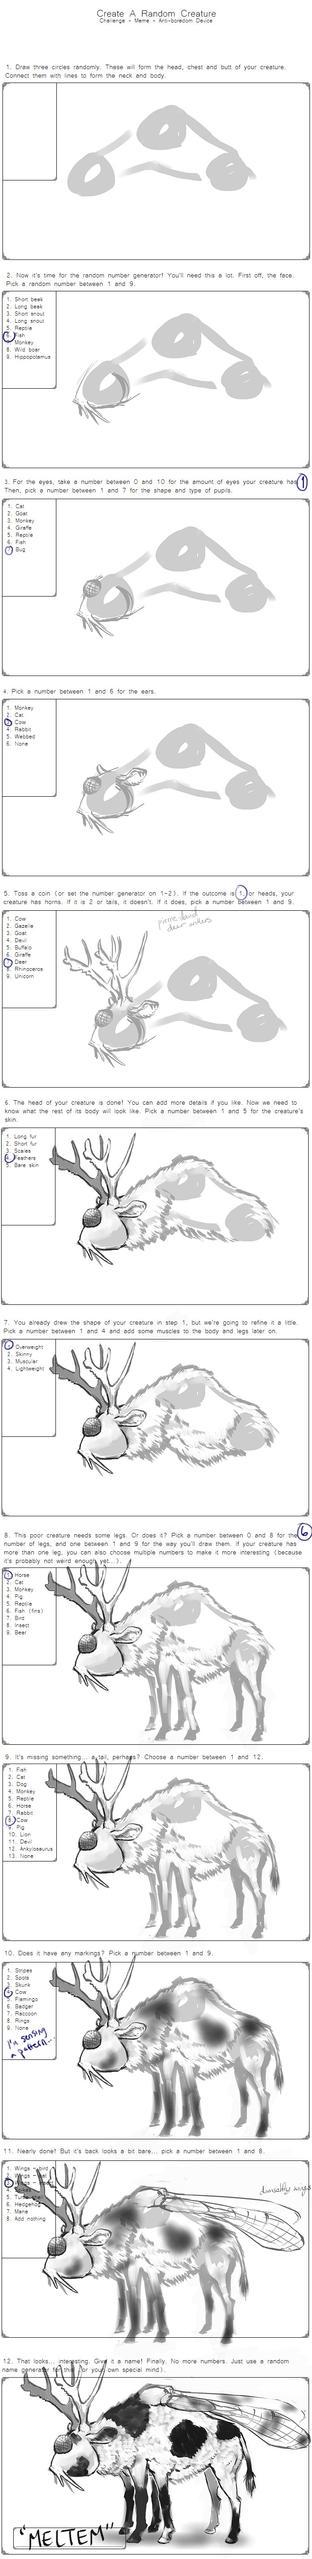 Creature creation meme by 5-prime